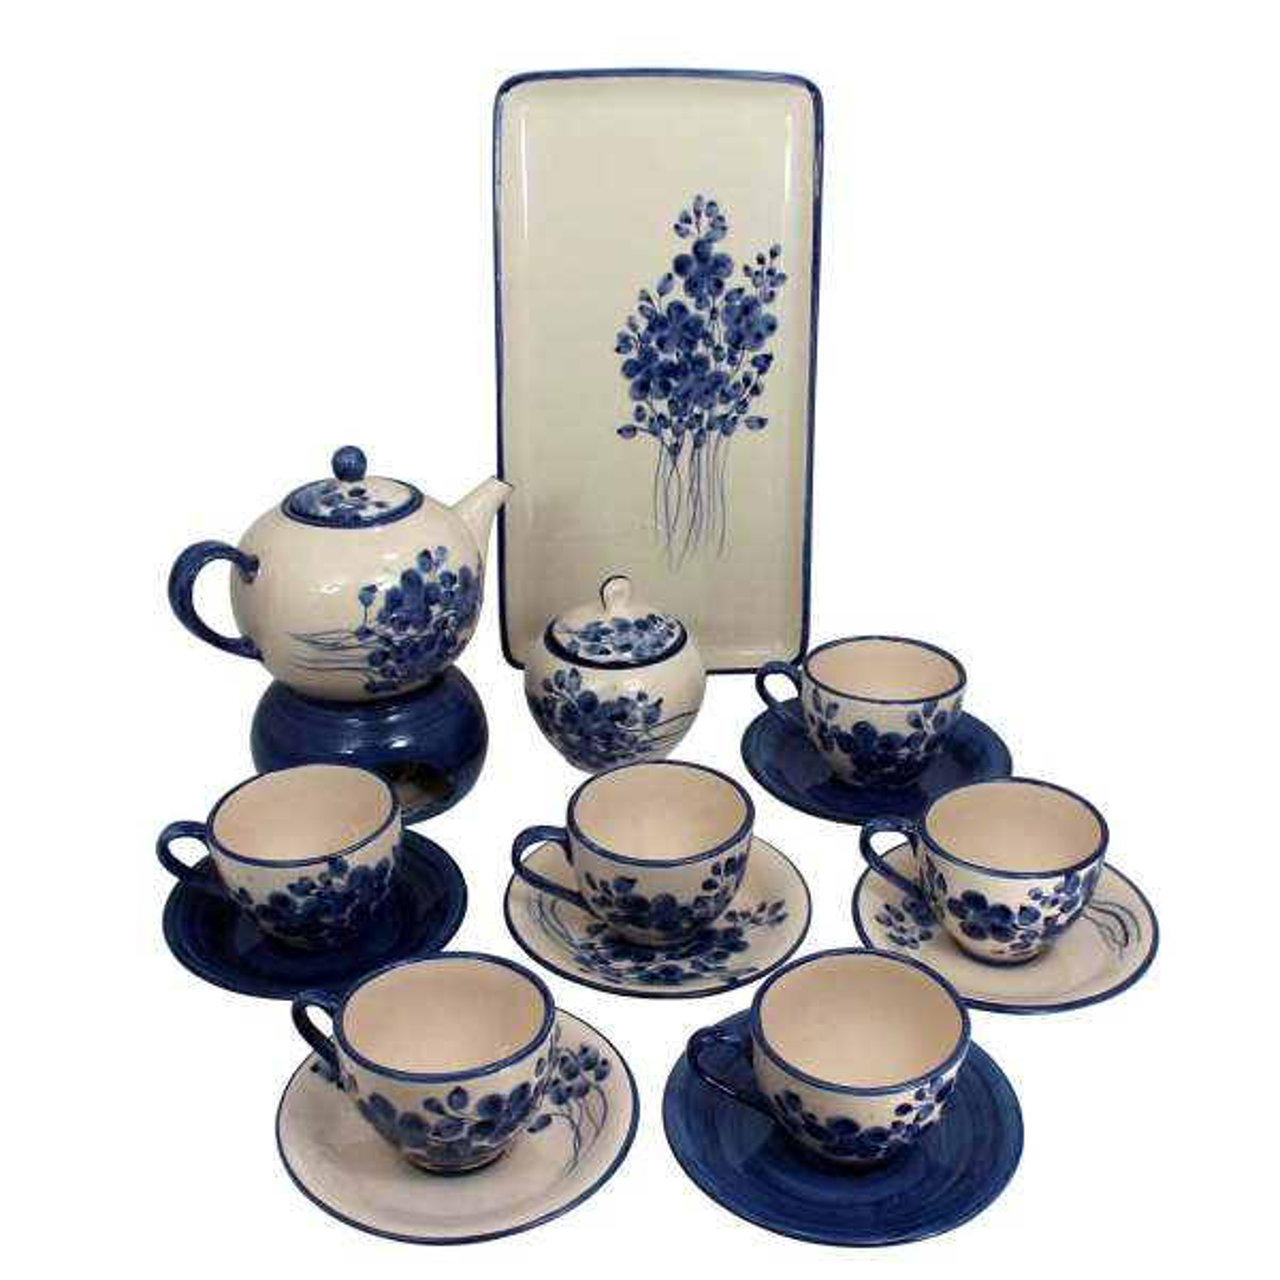 سرویس چایخوری 16 پارچه سرامیکی دست نگار طرح گل برونزا